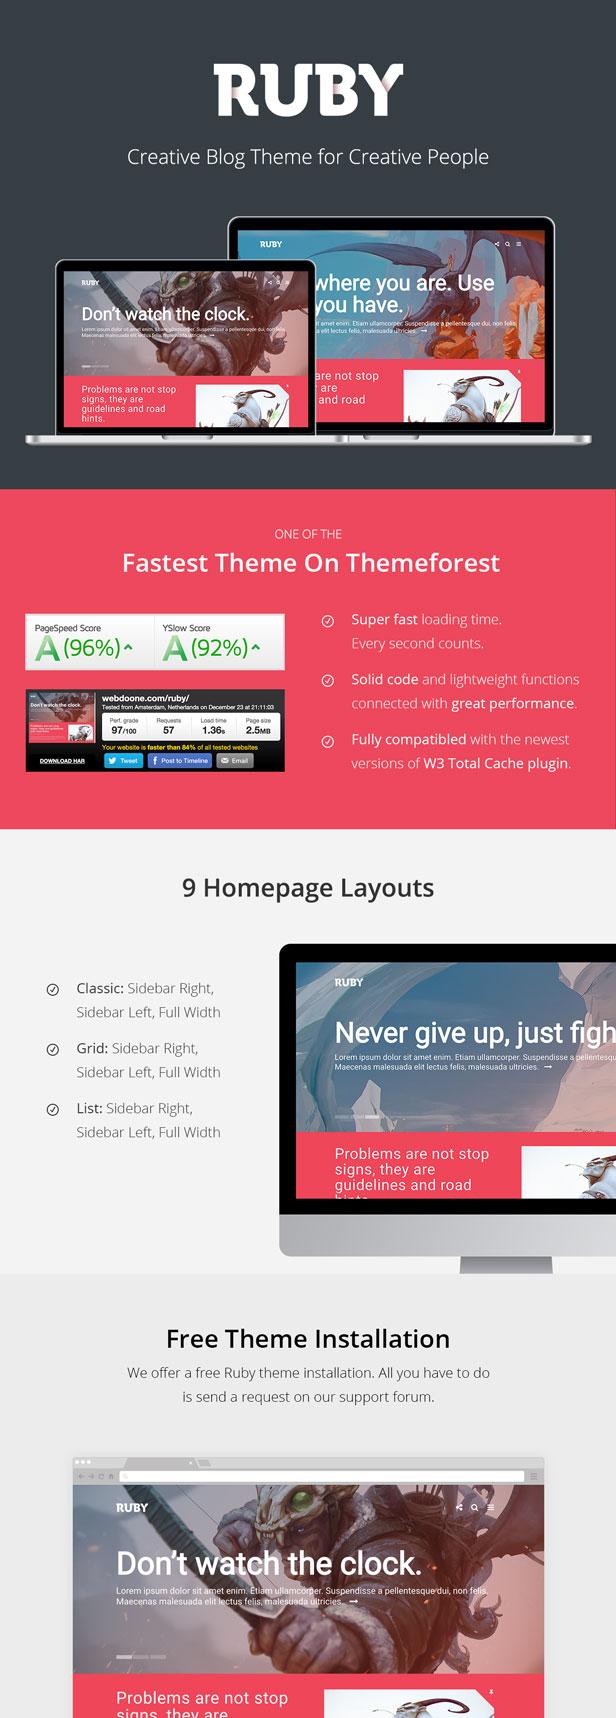 Ruby Theme - Ein kreatives WordPress-Blog-Theme - 2